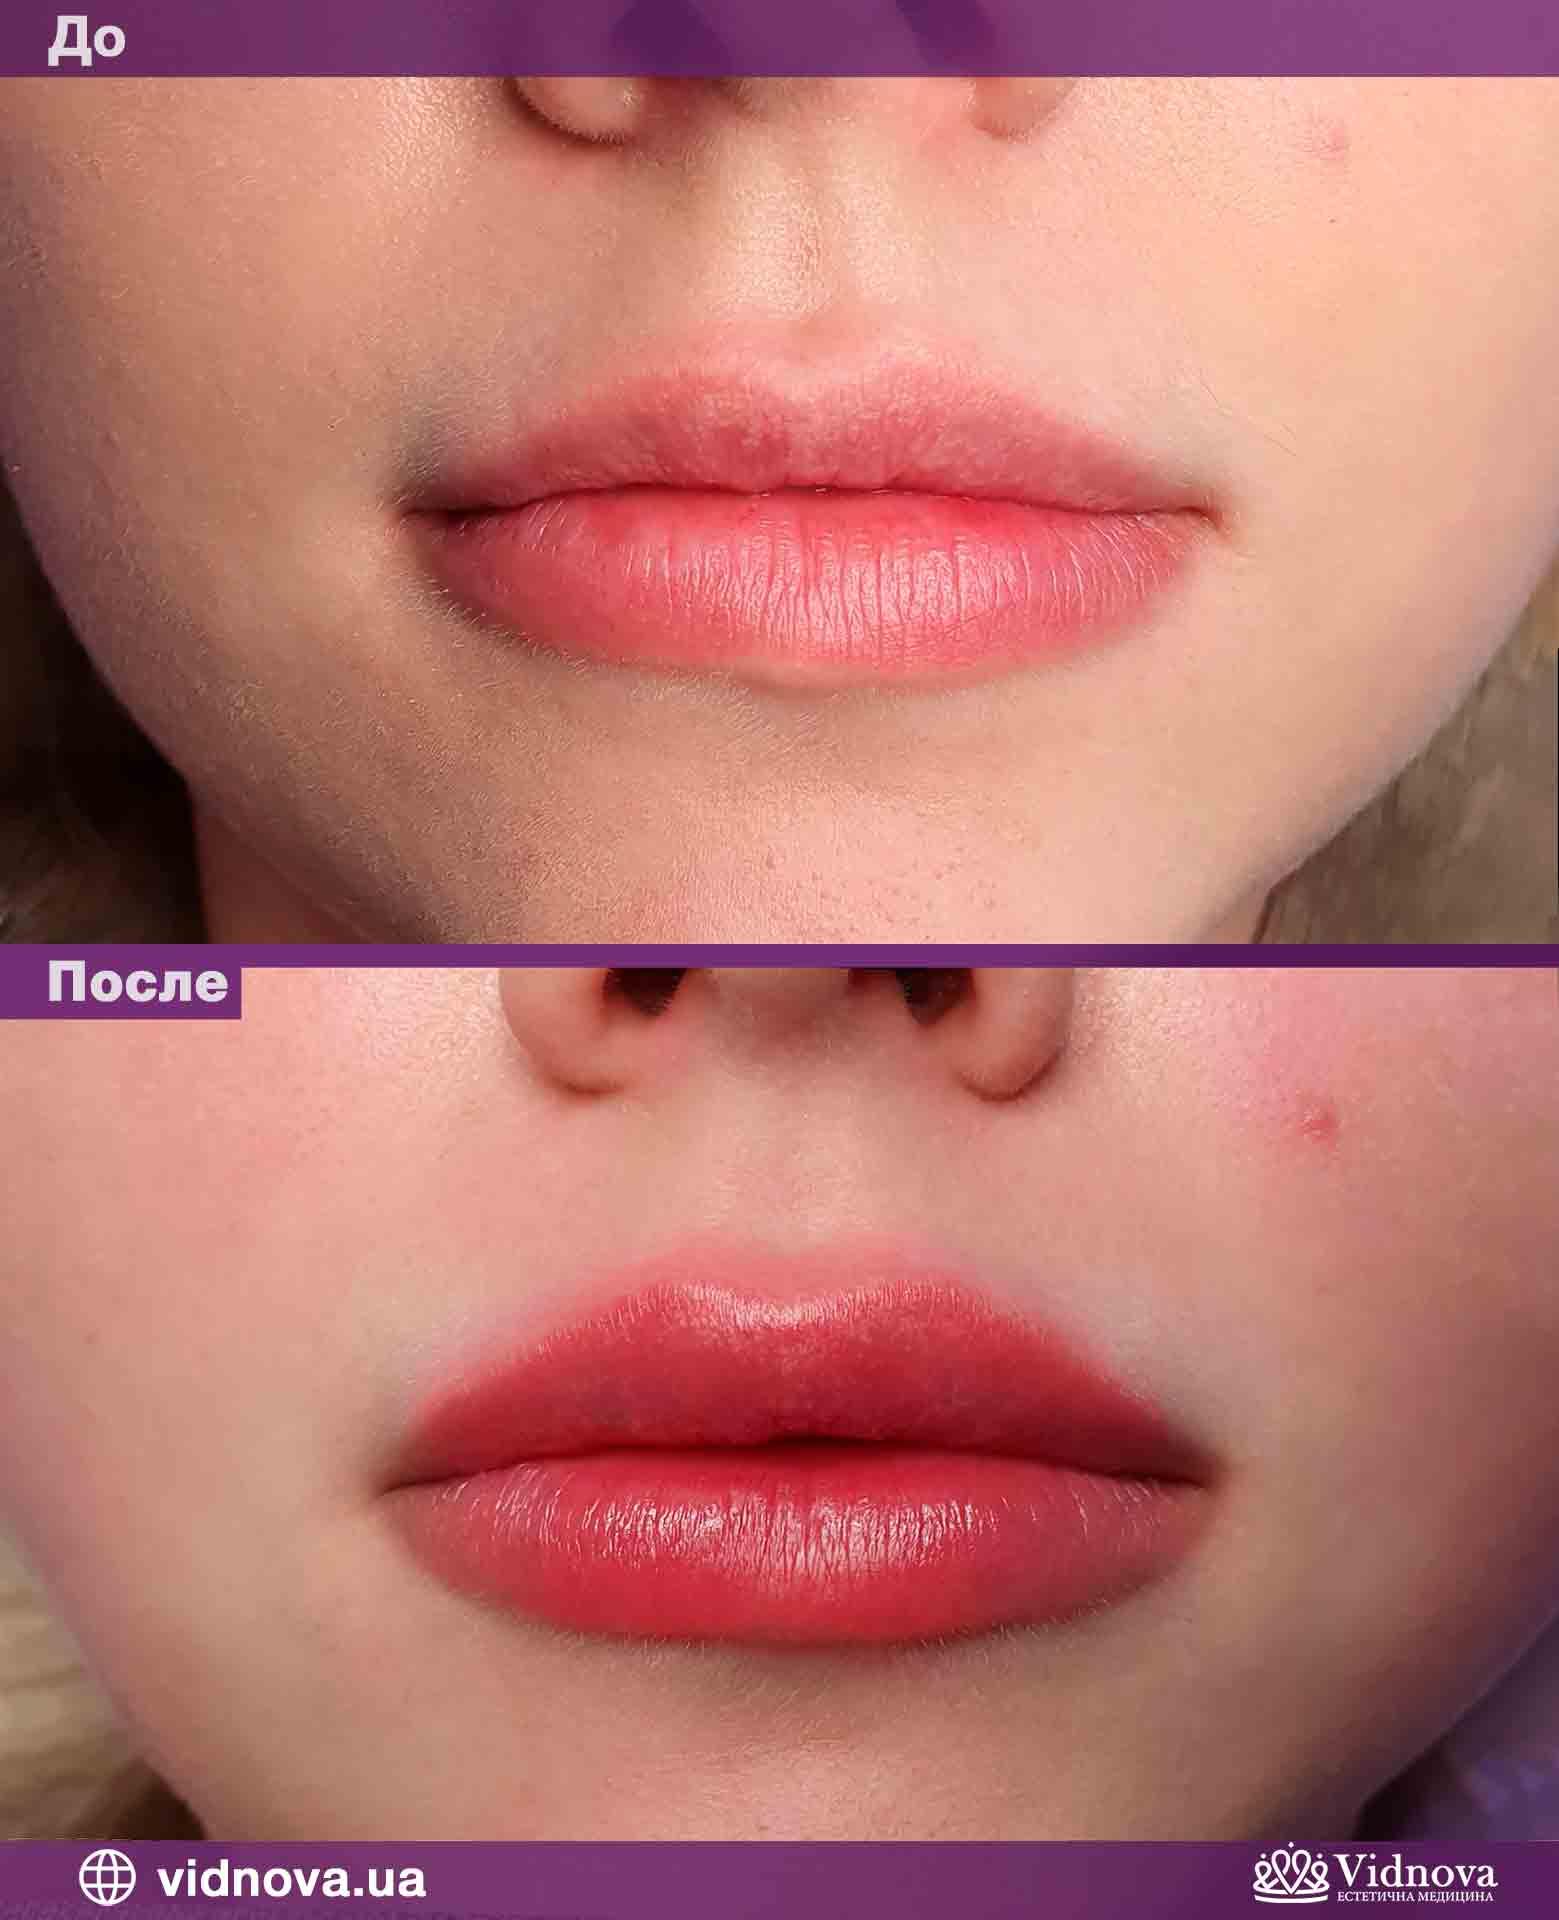 Увеличение губ: Фото До и После - Пример №5-3 - Клиника Vidnova